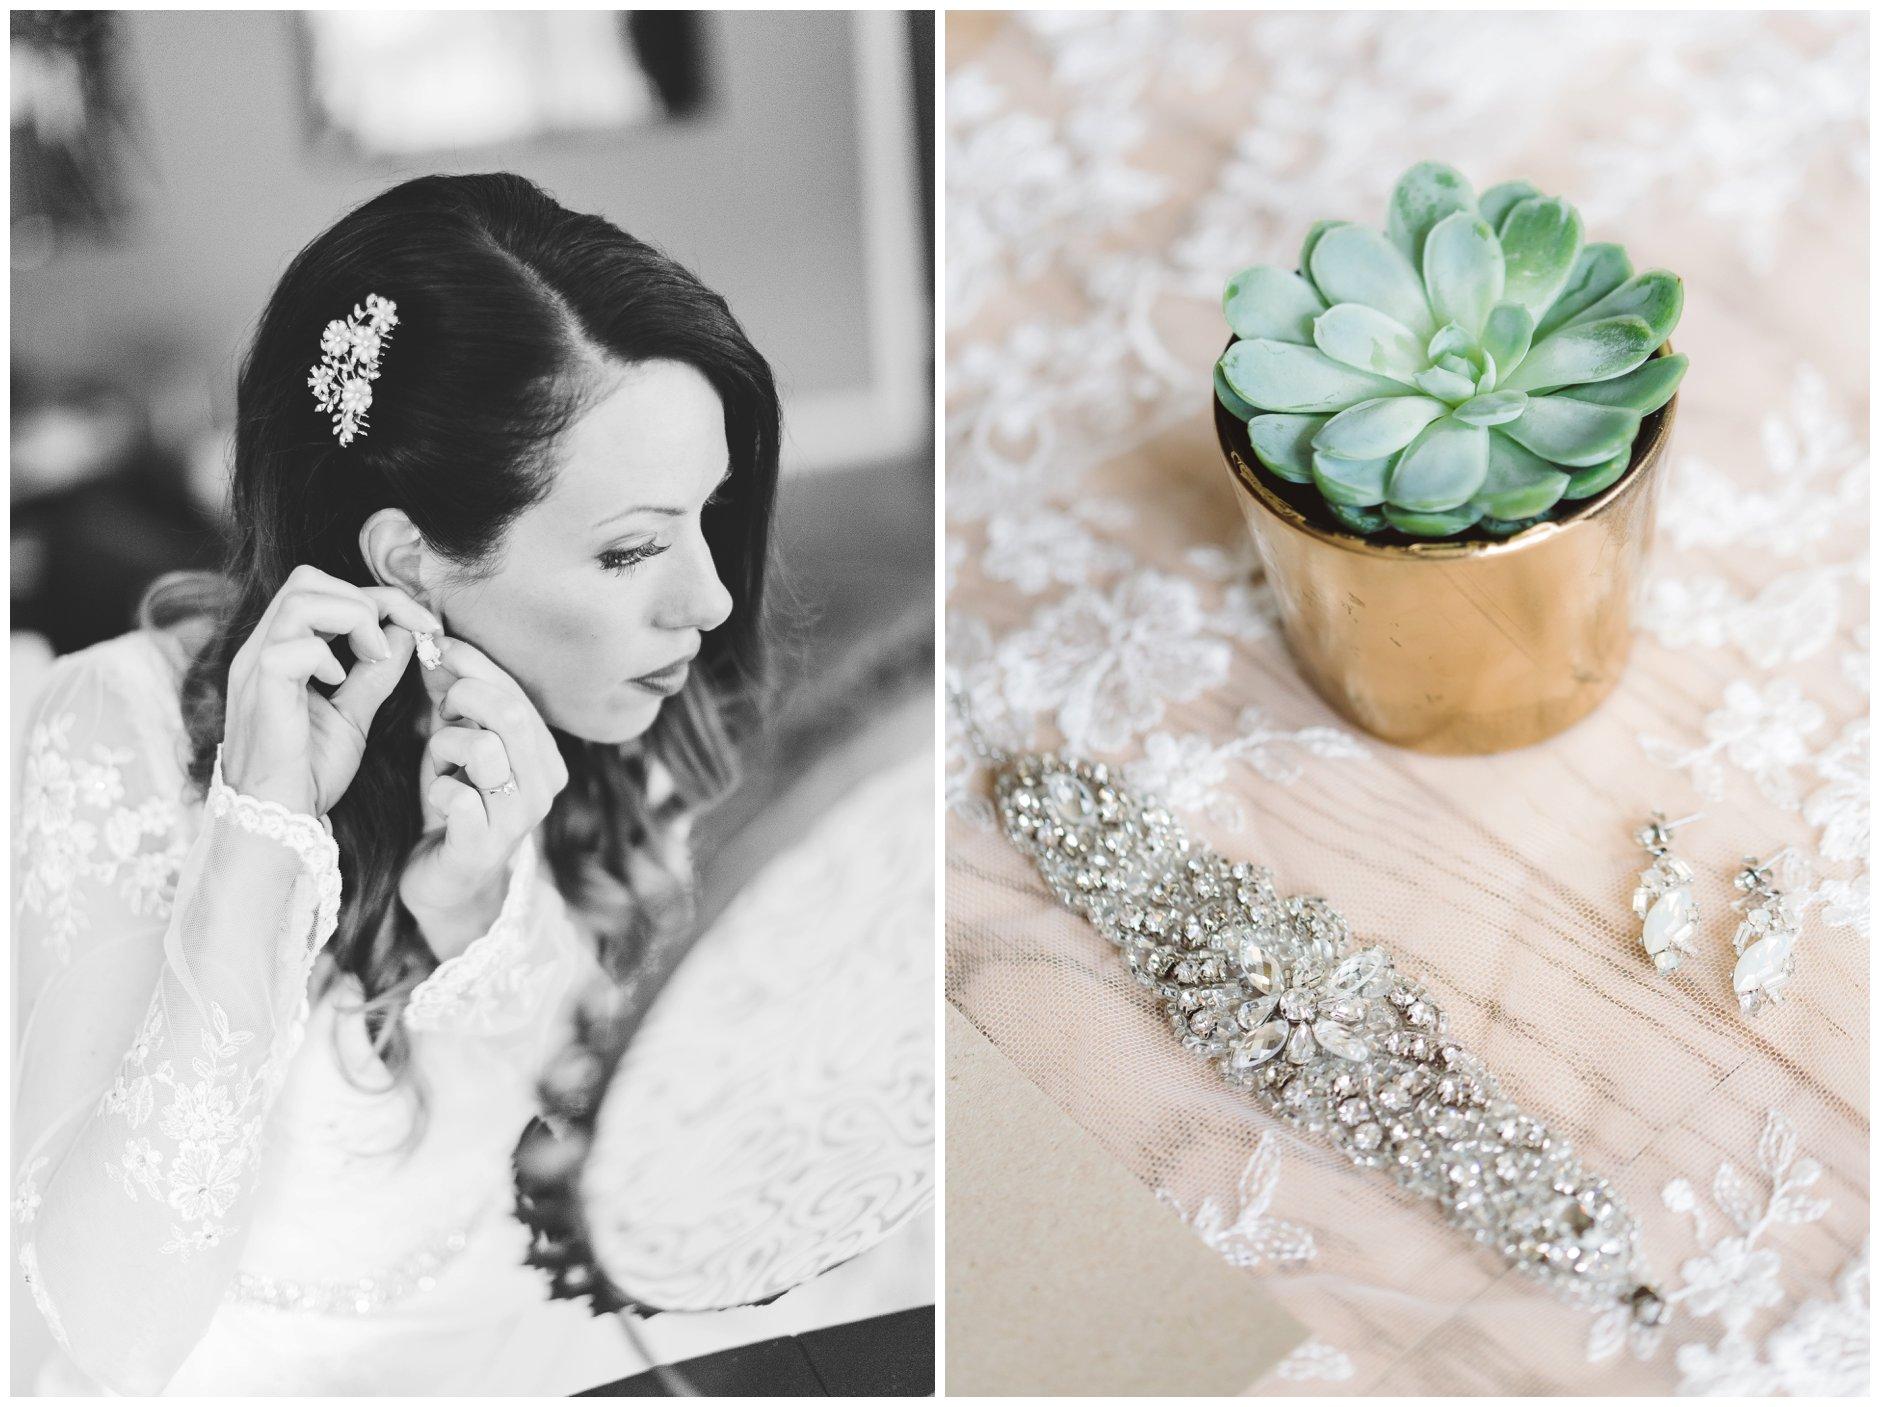 Fotograf-Eline-Jacobine-Bryllup-2015-beste-bilder_0003